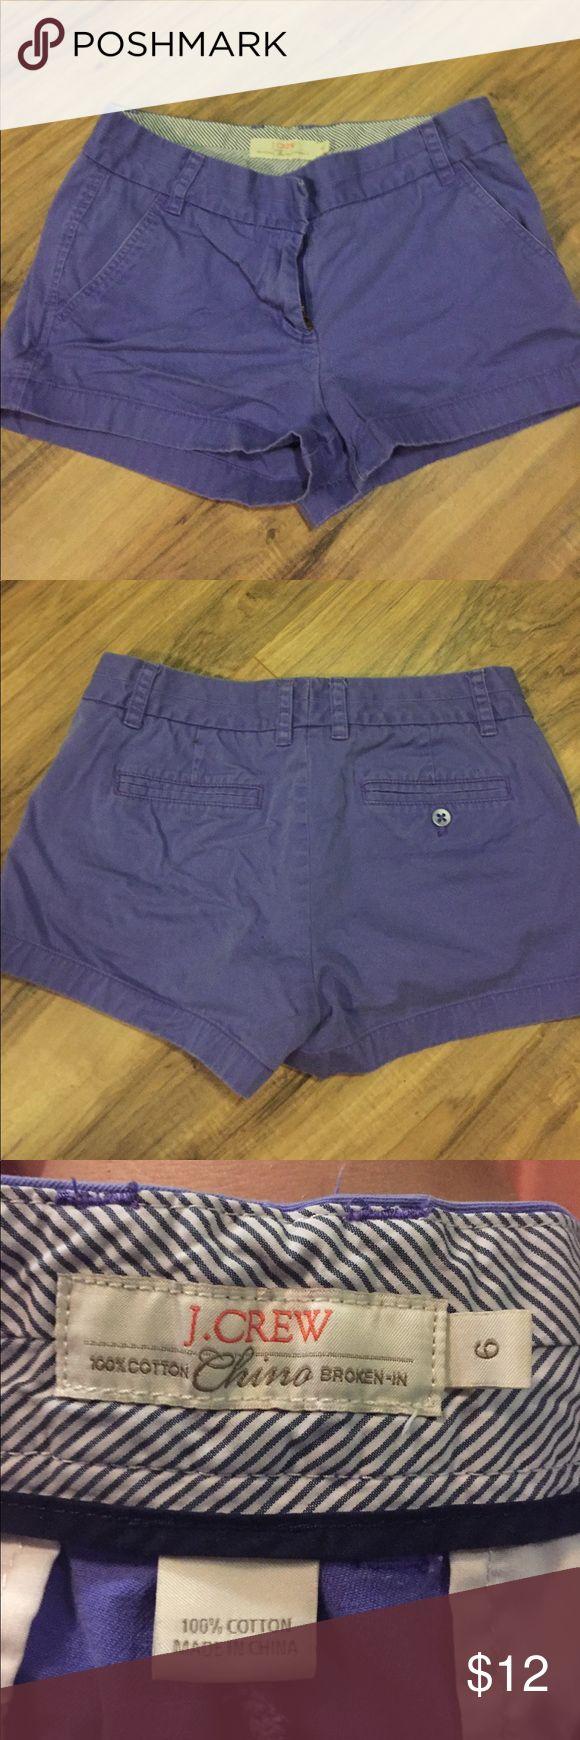 "J Crew chino shorts Purple J Crew chino shorts. 3"" inseam. Size 6. Great condition J. Crew Shorts"